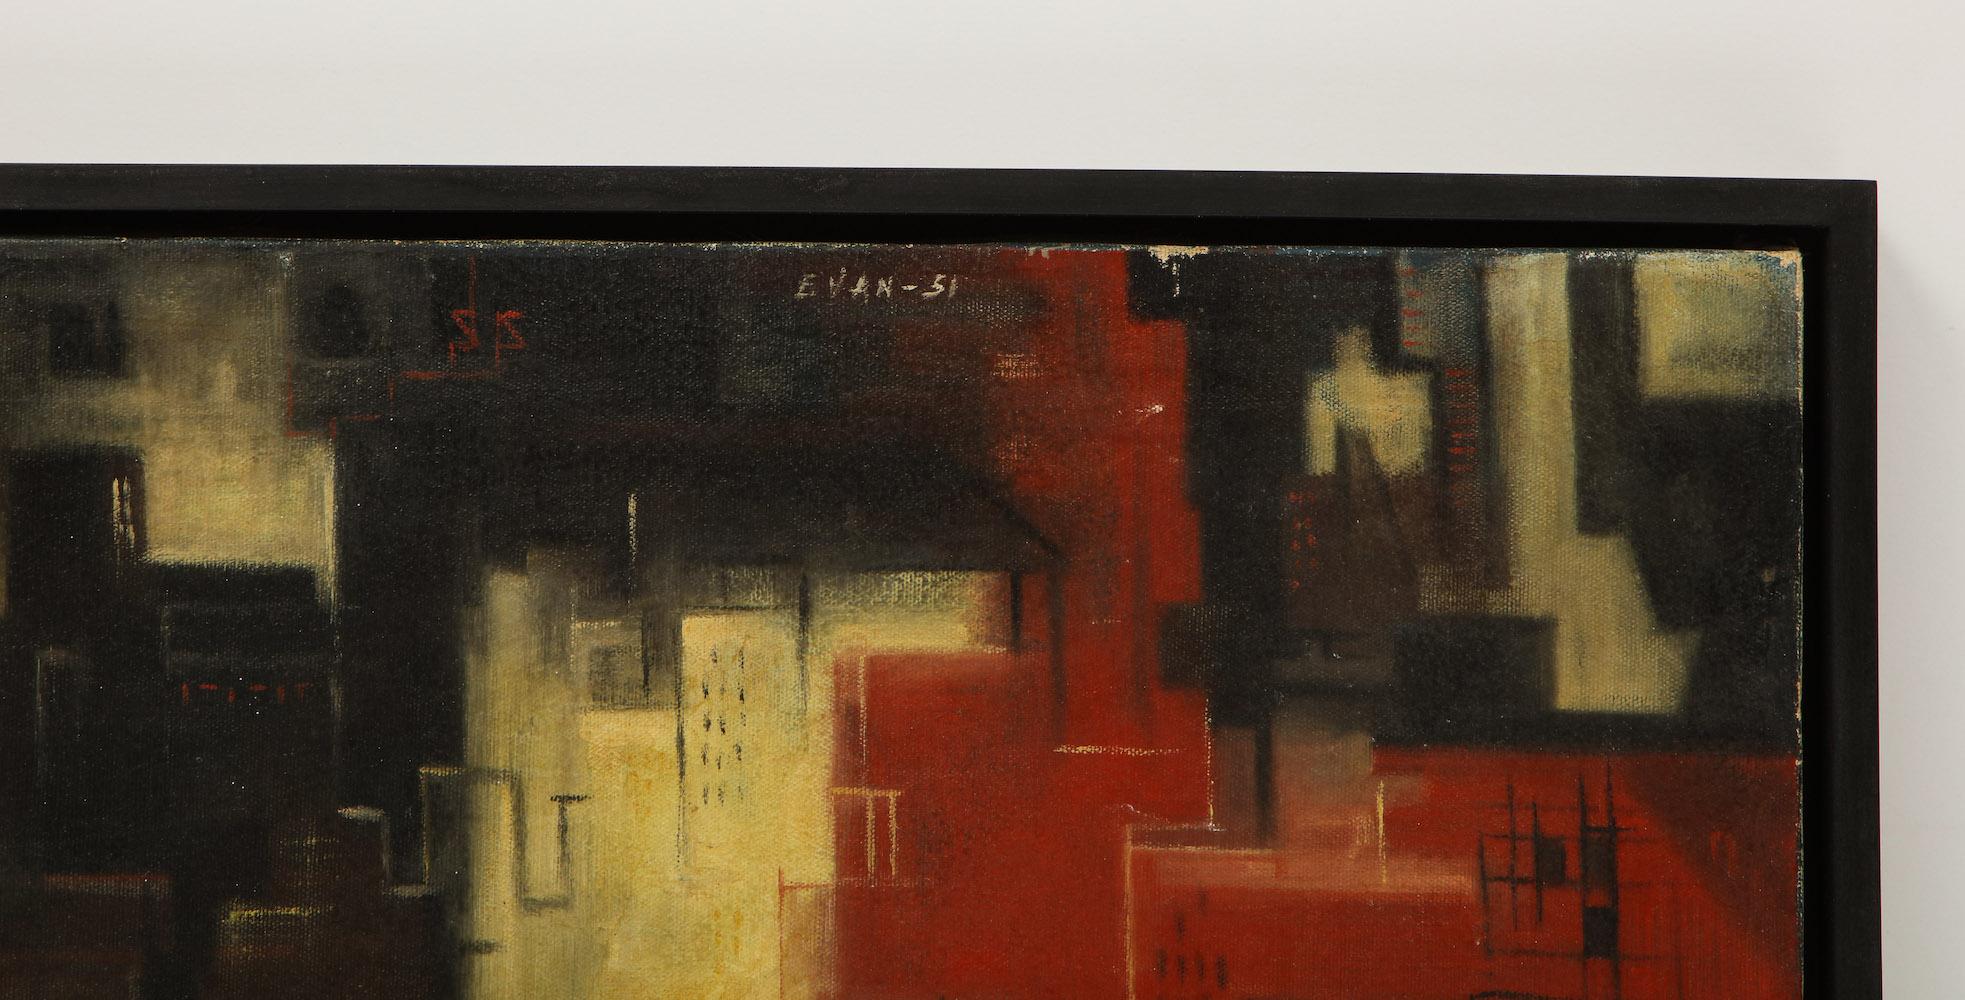 Luis Evan Cityscape Painting 3.jpg